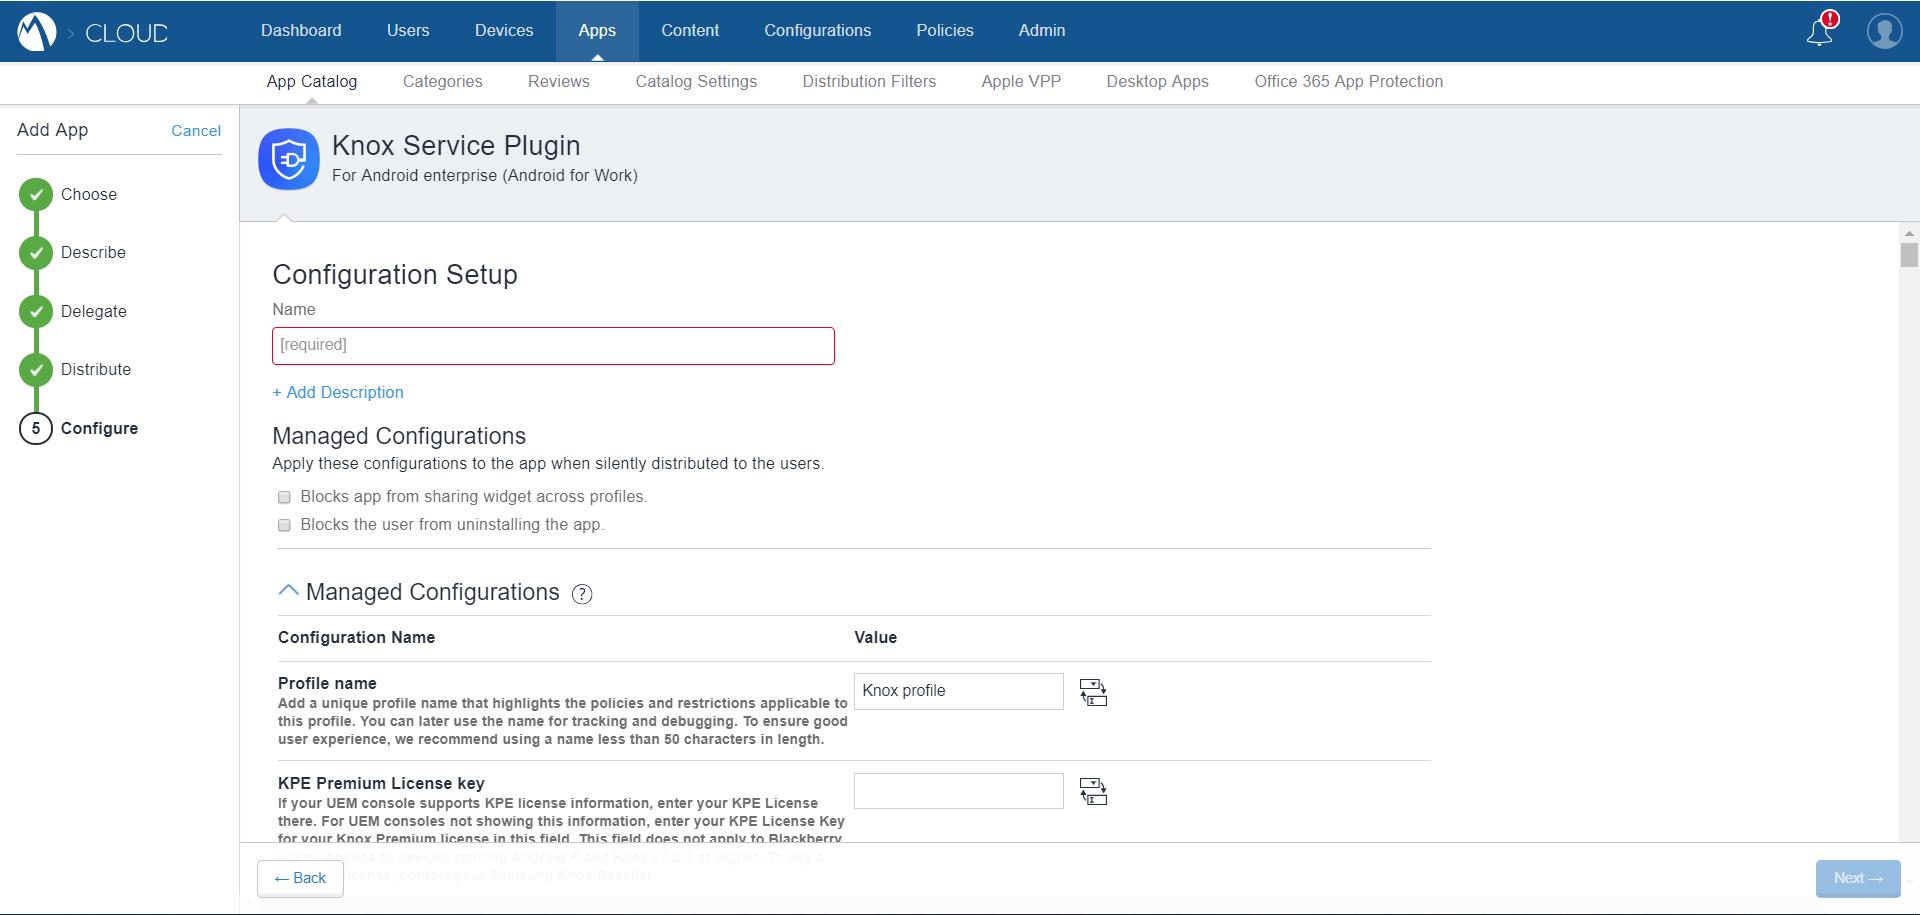 MobileIron Cloud App Catalog - Knox Service Plugin - Managed Configurations